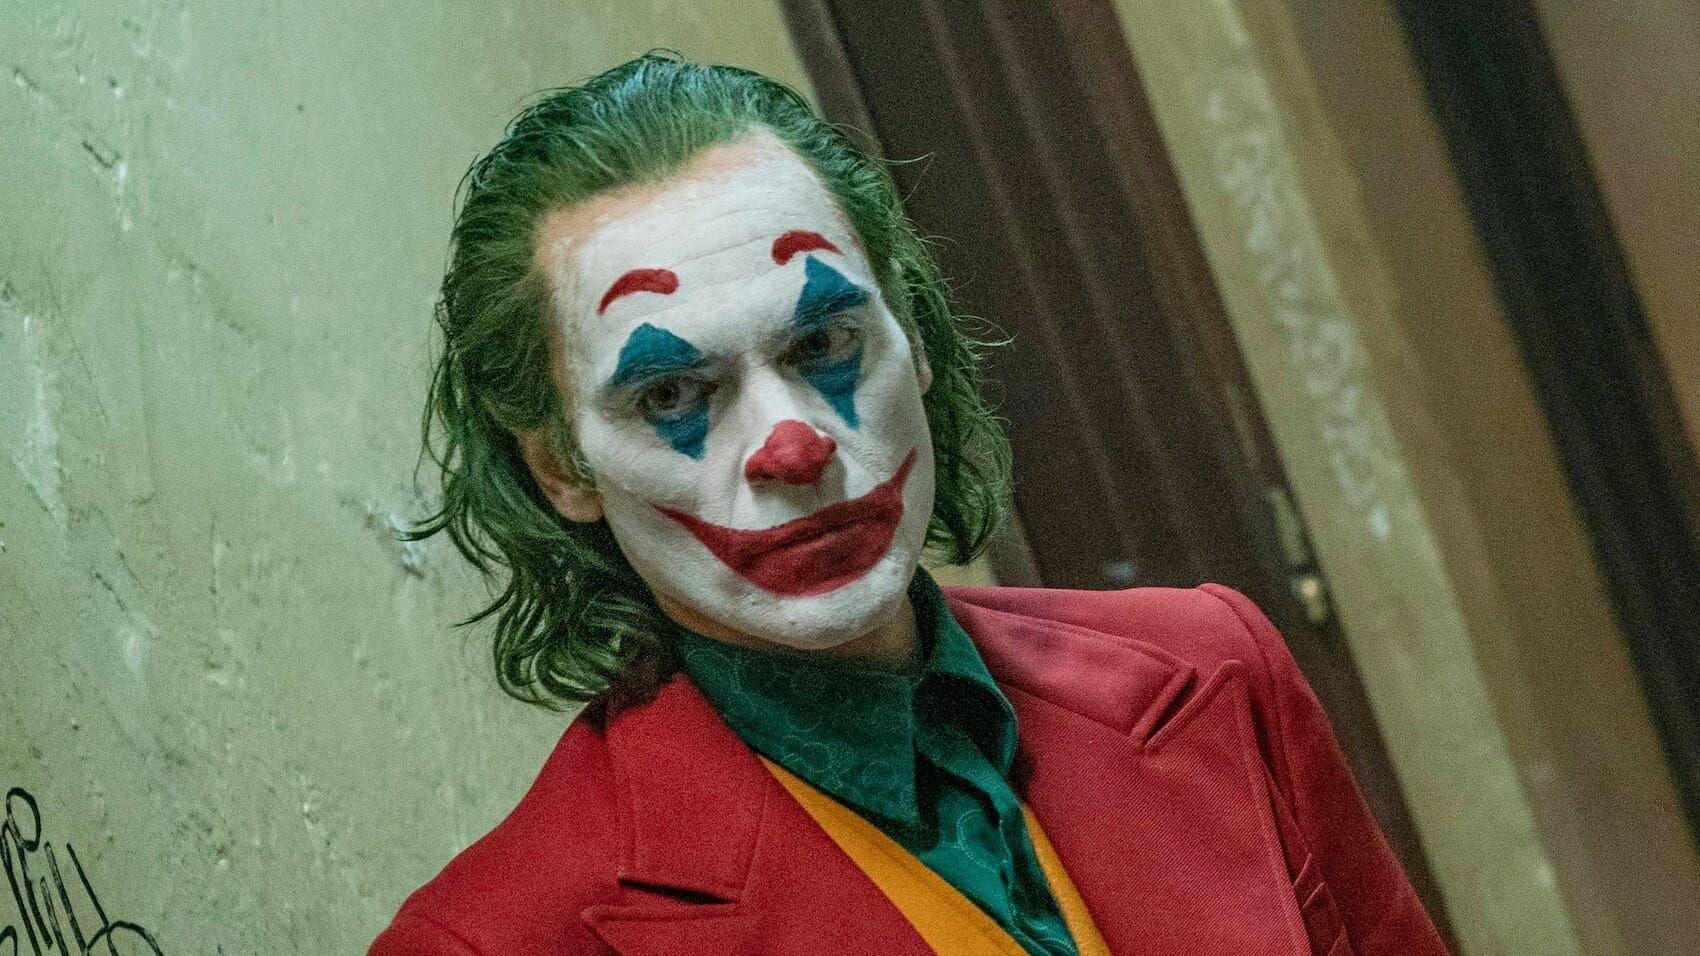 ¿Habrá 'Joker 2'? Su director, Todd Phillips, responde